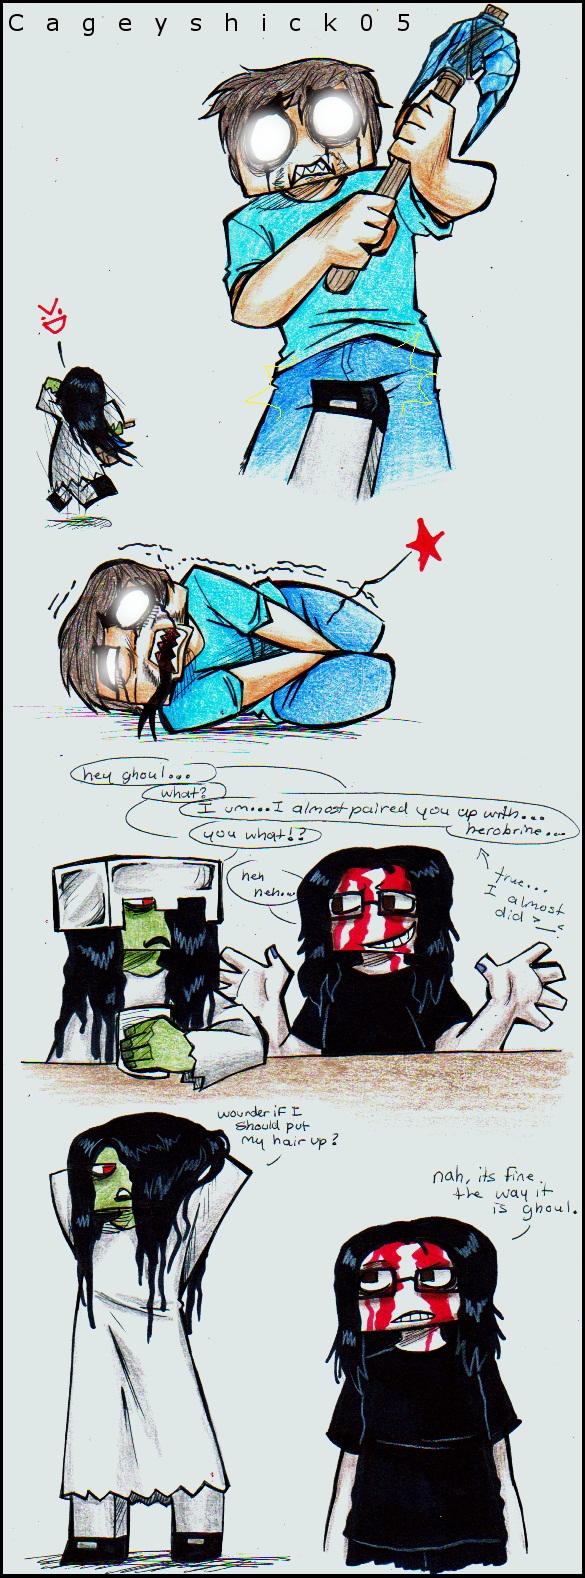 http://img.niceminecraft.net/Funny/Minecraft-comic-18-2.jpg